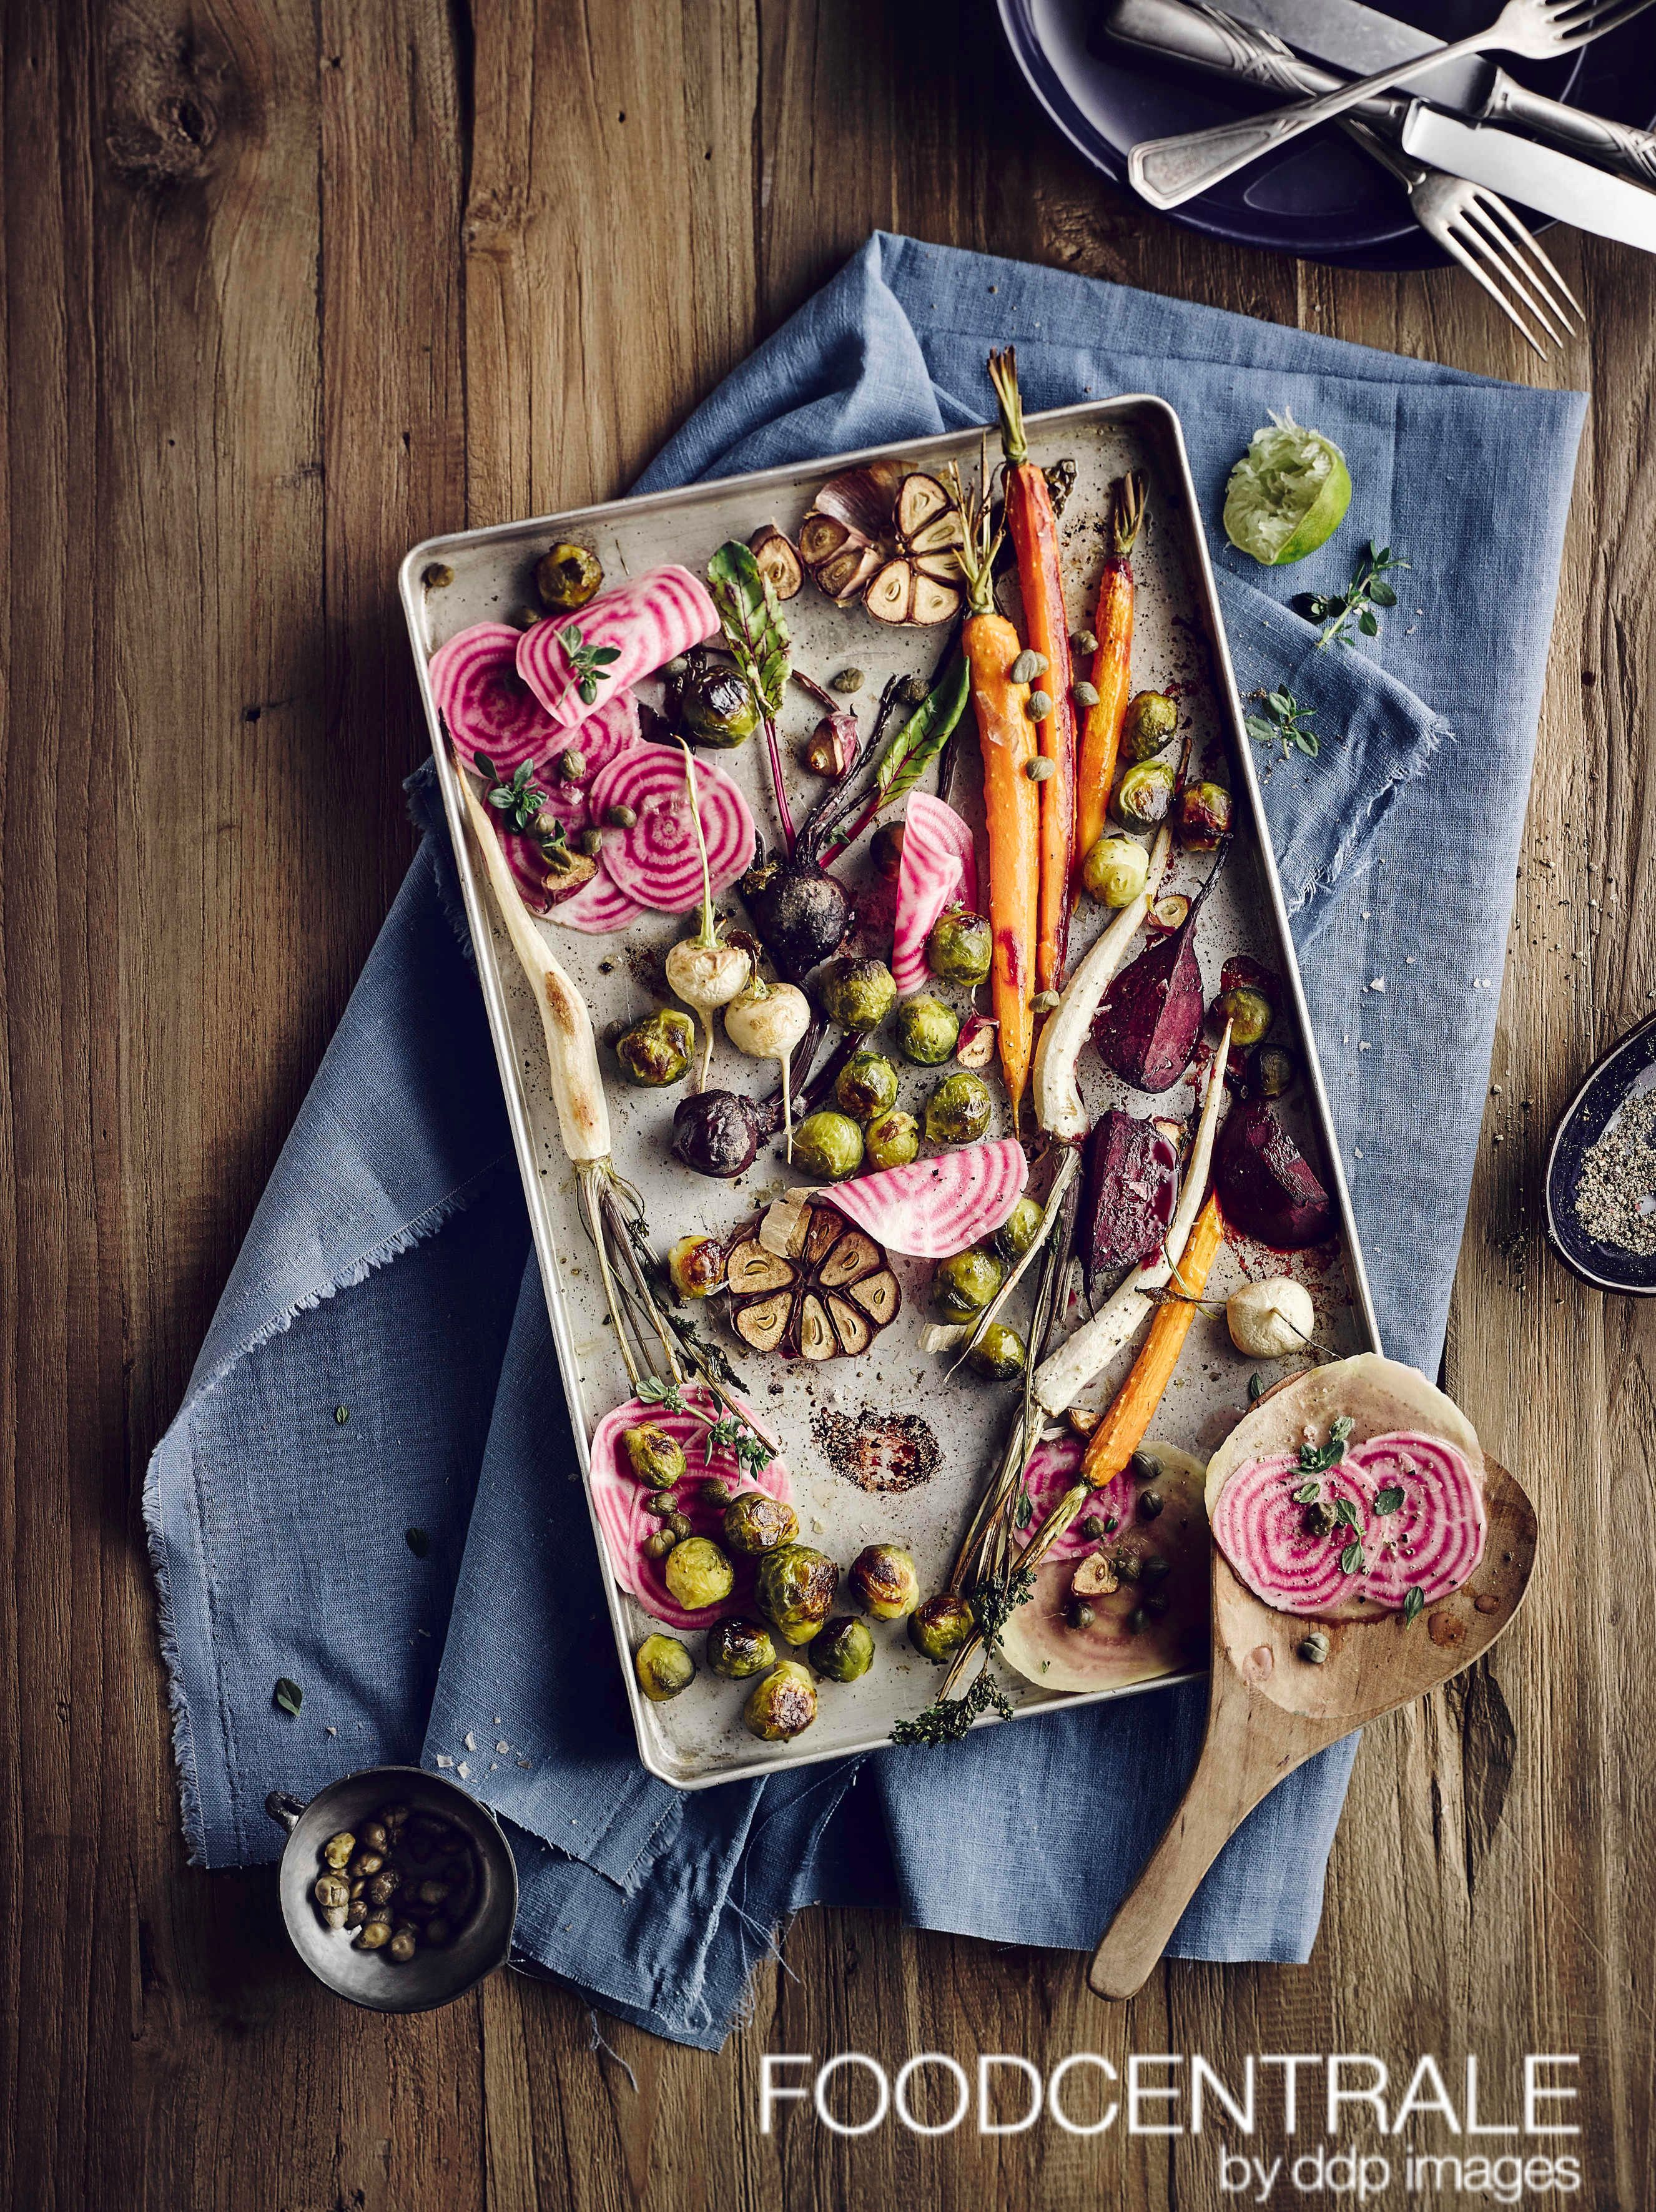 Rosenkohl und Wurzeln mit Kapern vom Blech by Rolf Seiffe/FoodCentrale (00778648). #foodcentrale #ddpimages #ddp #foodpic #foodlove #foodphotography #foodpost #foodinspiration #foodpicoftheday #foodshot #instafood #instafoodie #yummy #yummie #foodiegram #foodstagram #saisonal #season #vegetarisch #vegetarian #ofengemuese #healthyfood #autumn #herbst #herbstlich